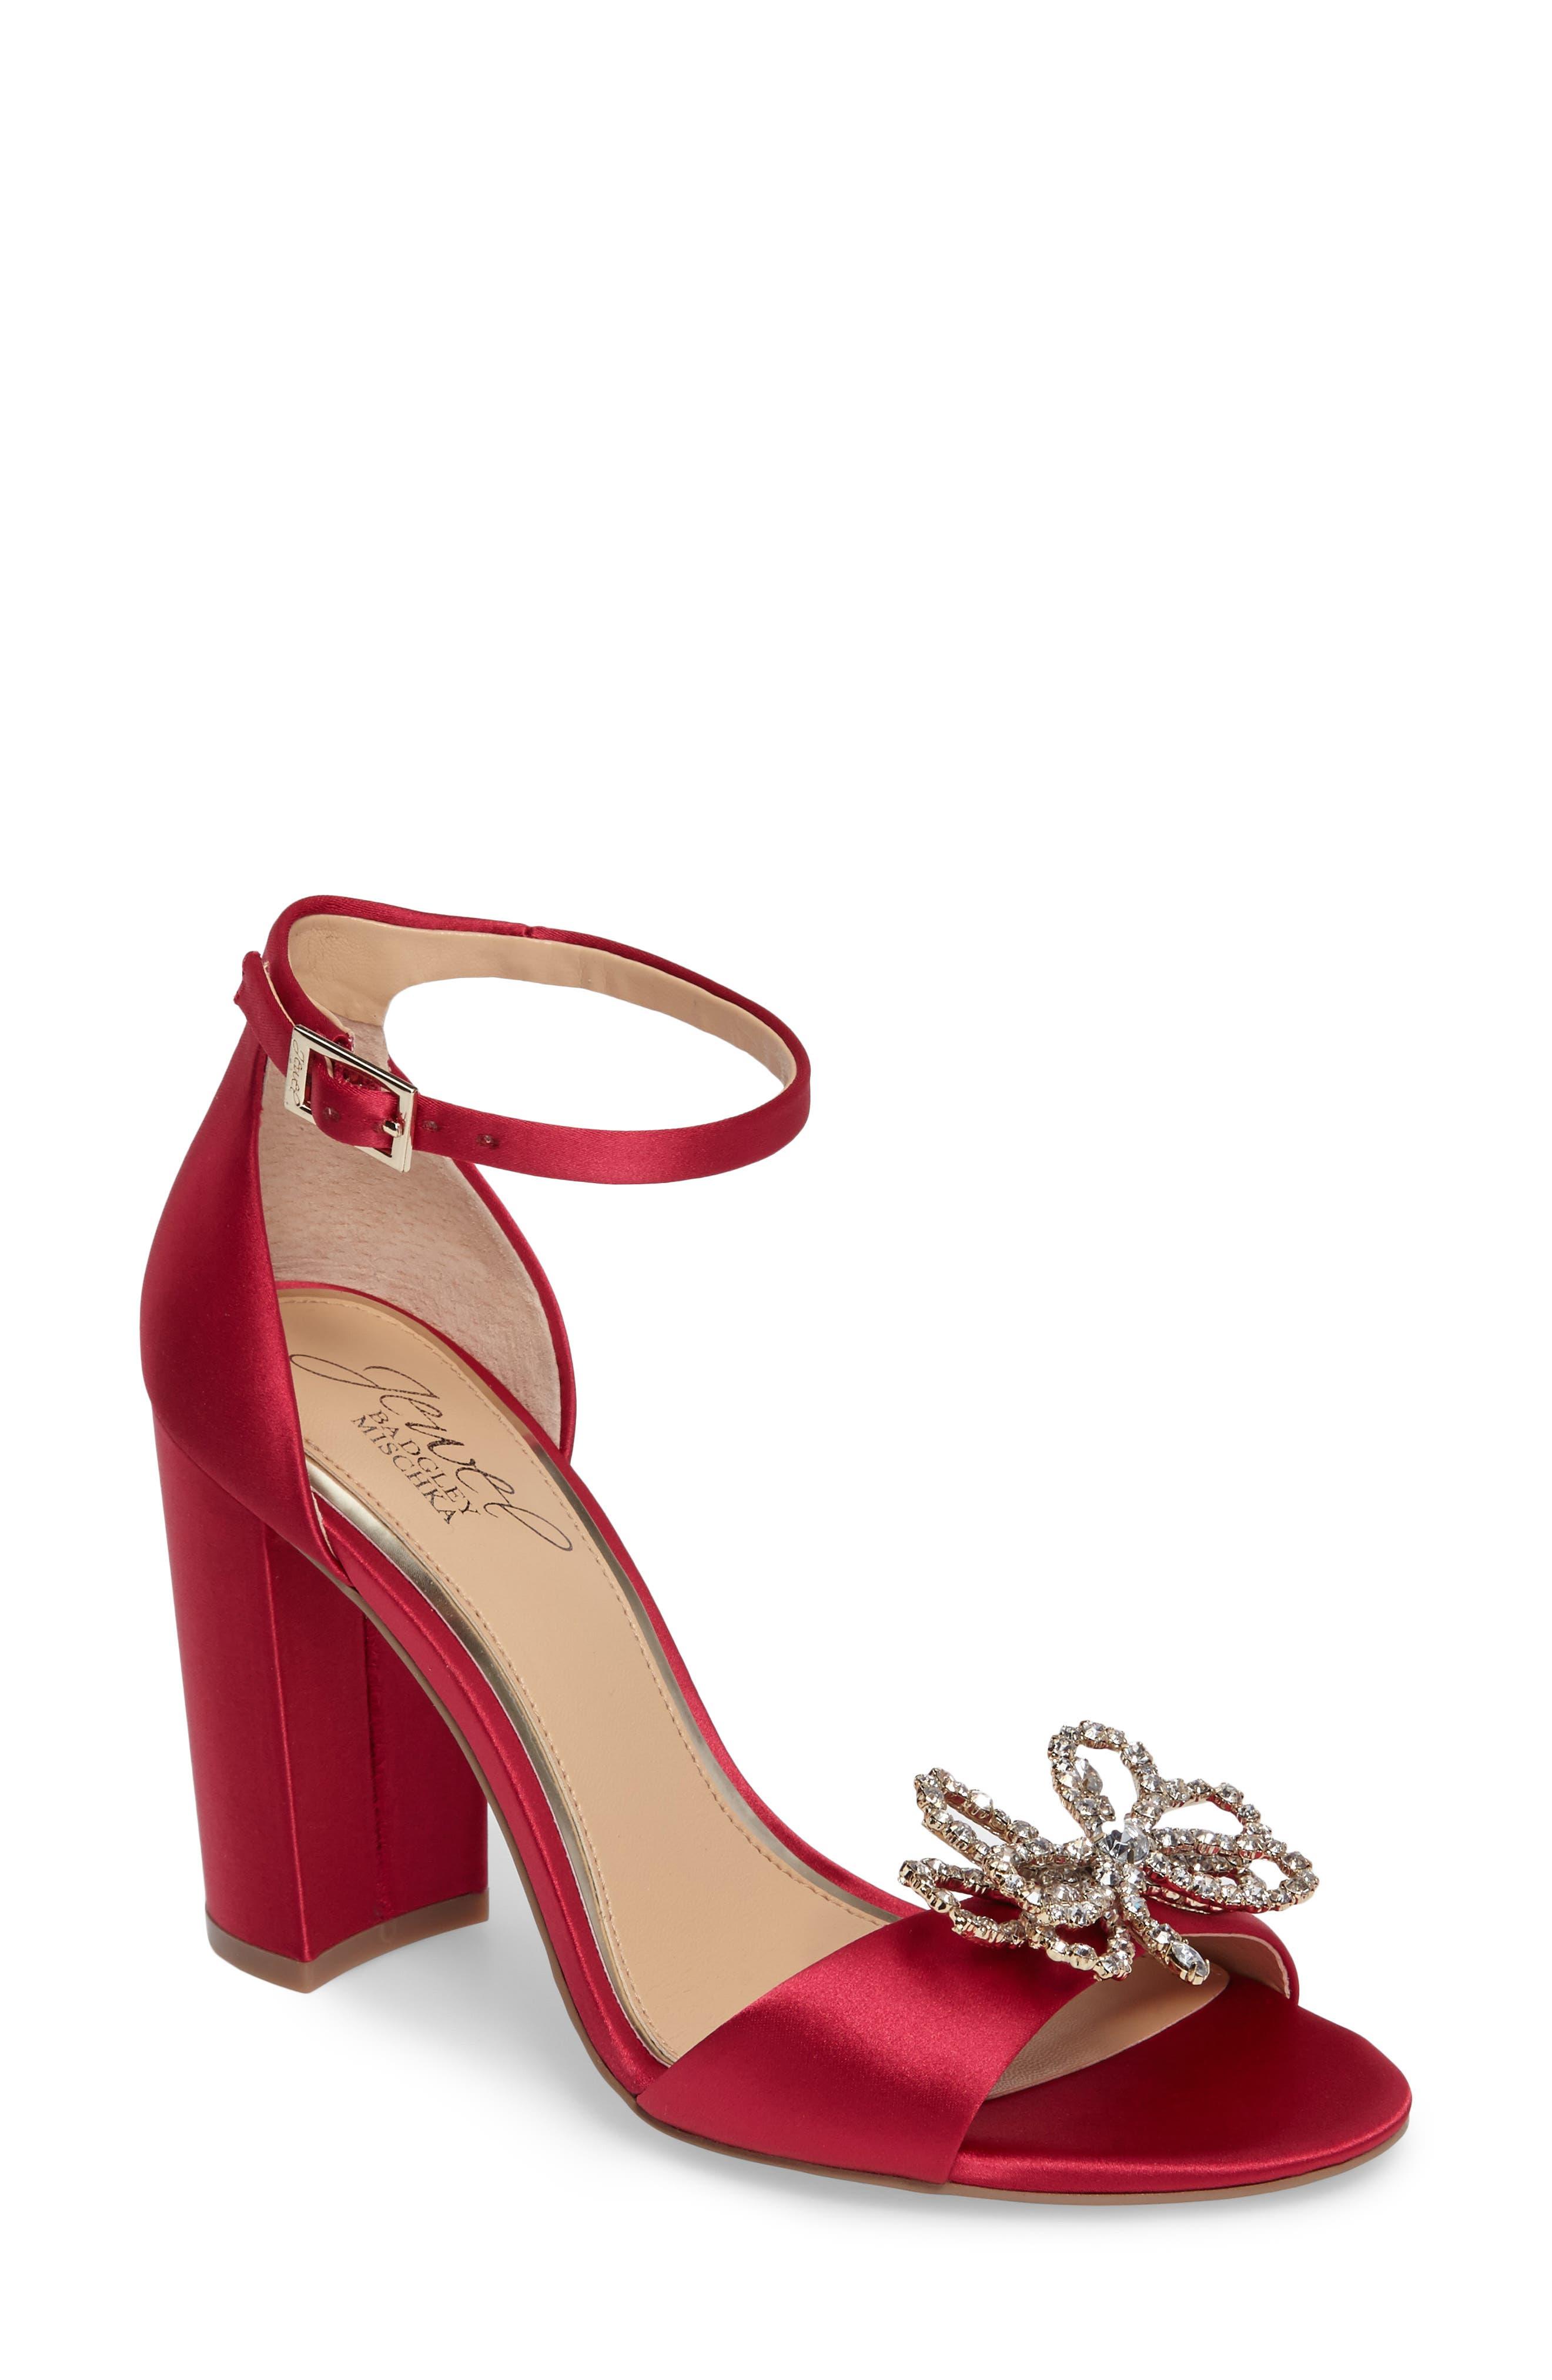 Jewel Badgley Mischka Lex Embellished Block Heel Sandal (Women)